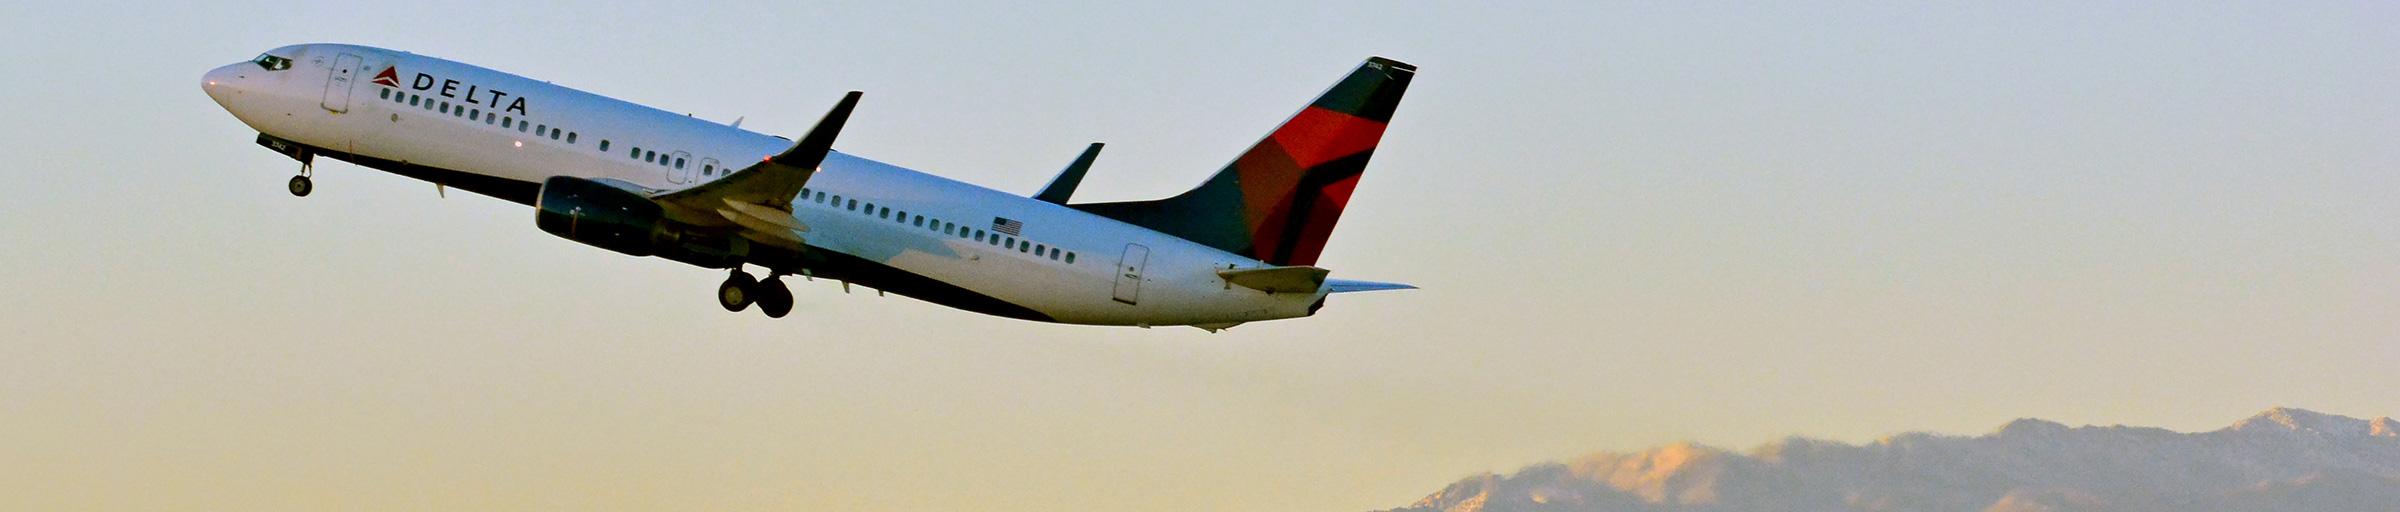 Delta Flight 2769 | WoodWorking